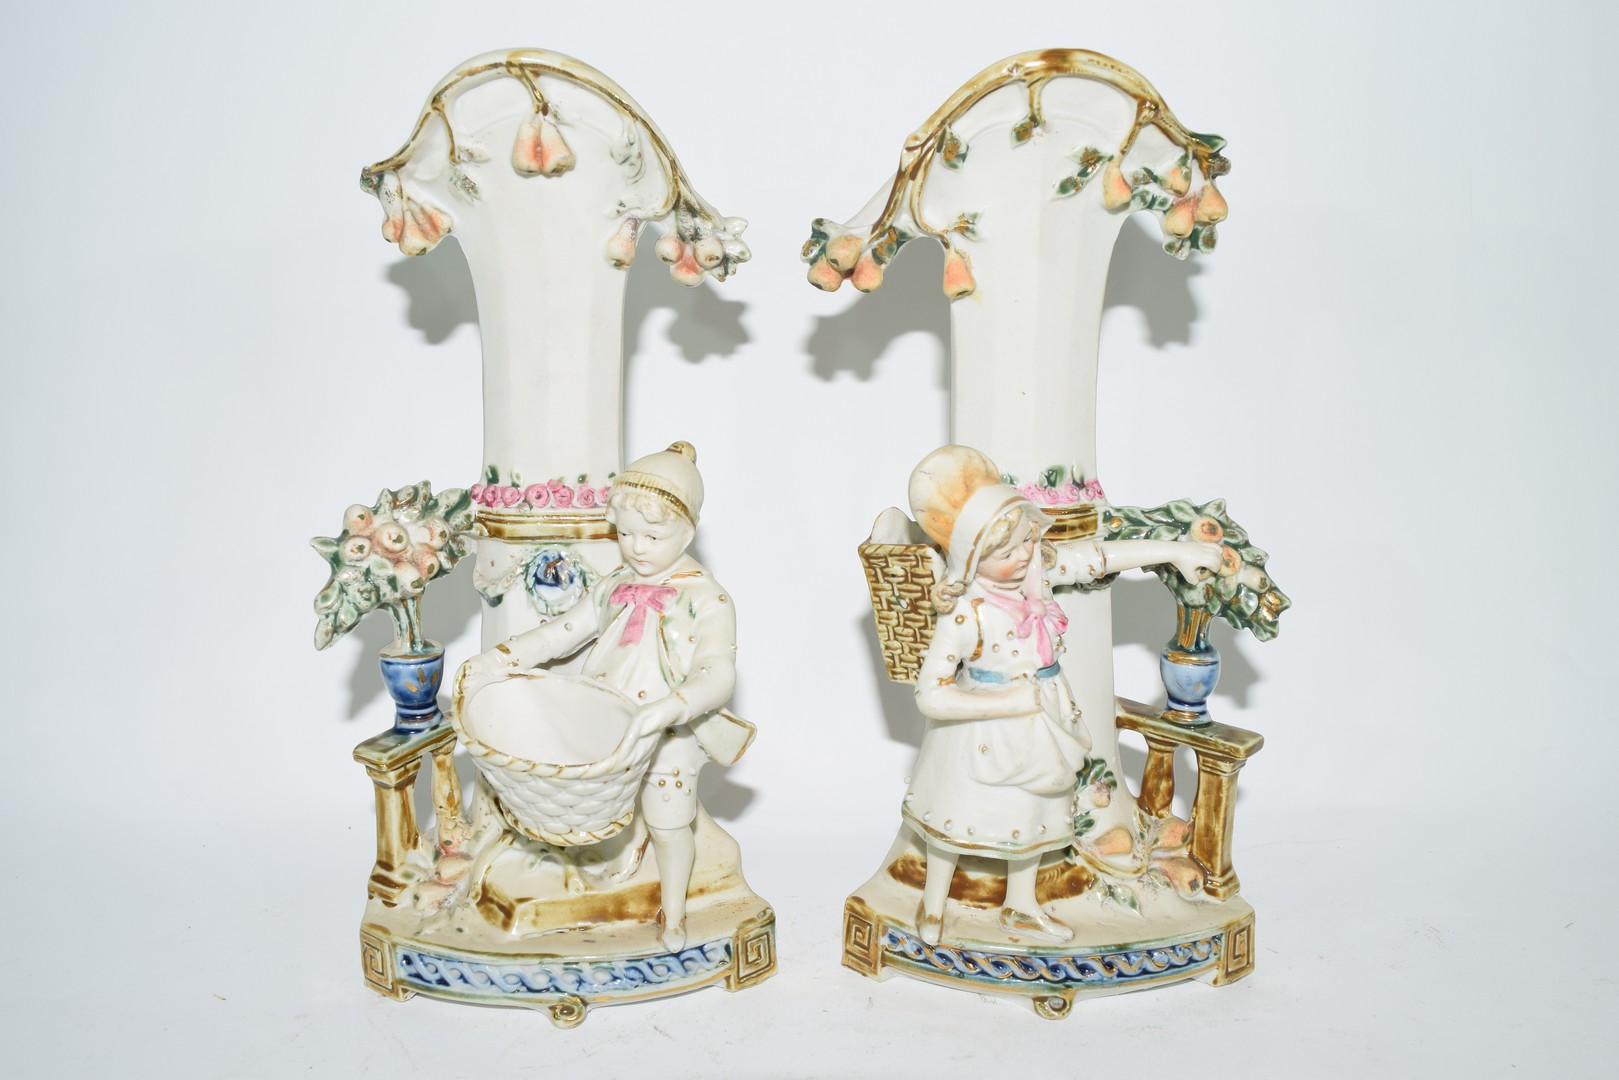 Pair of bisque porcelain spill holder vases